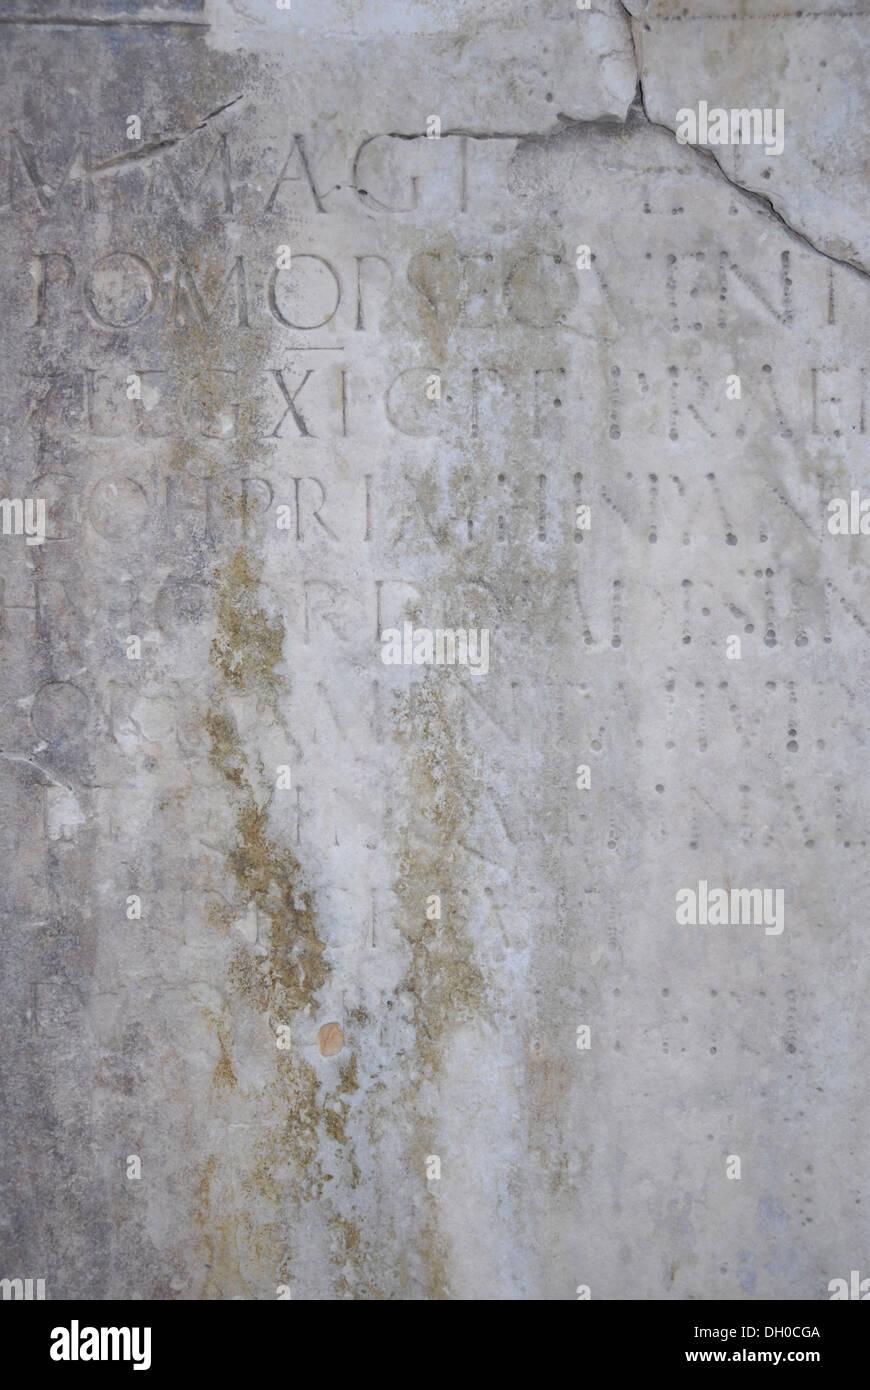 Ancient roman stone tablet with a latin inscription 1st century ad ancient roman stone tablet with a latin inscription 1st century ad forum of zadar dalmatia croatia europe publicscrutiny Image collections